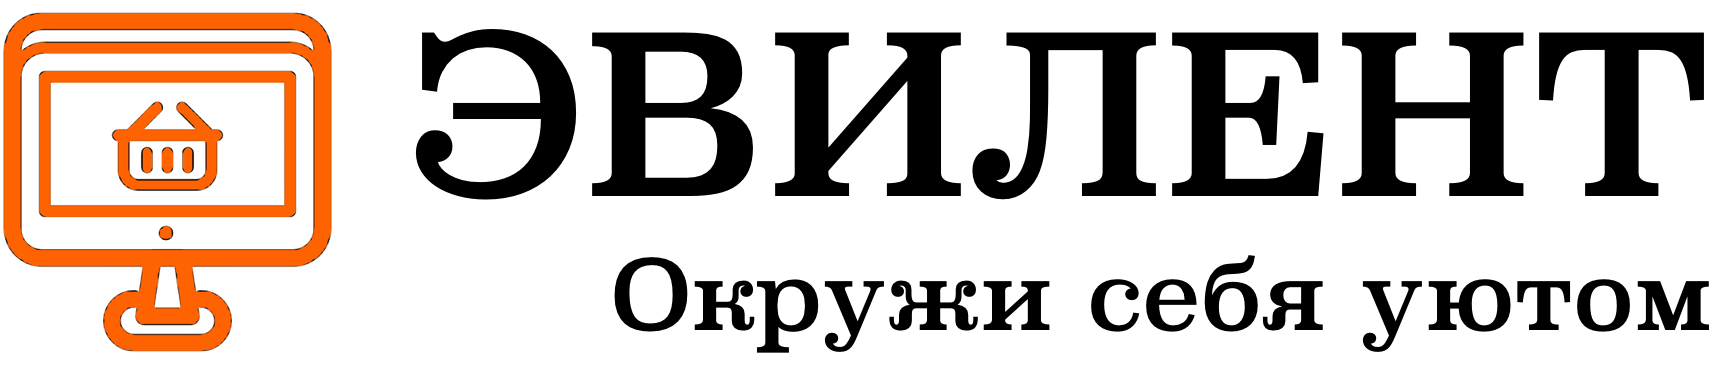 Интернет-магазин Эвилент